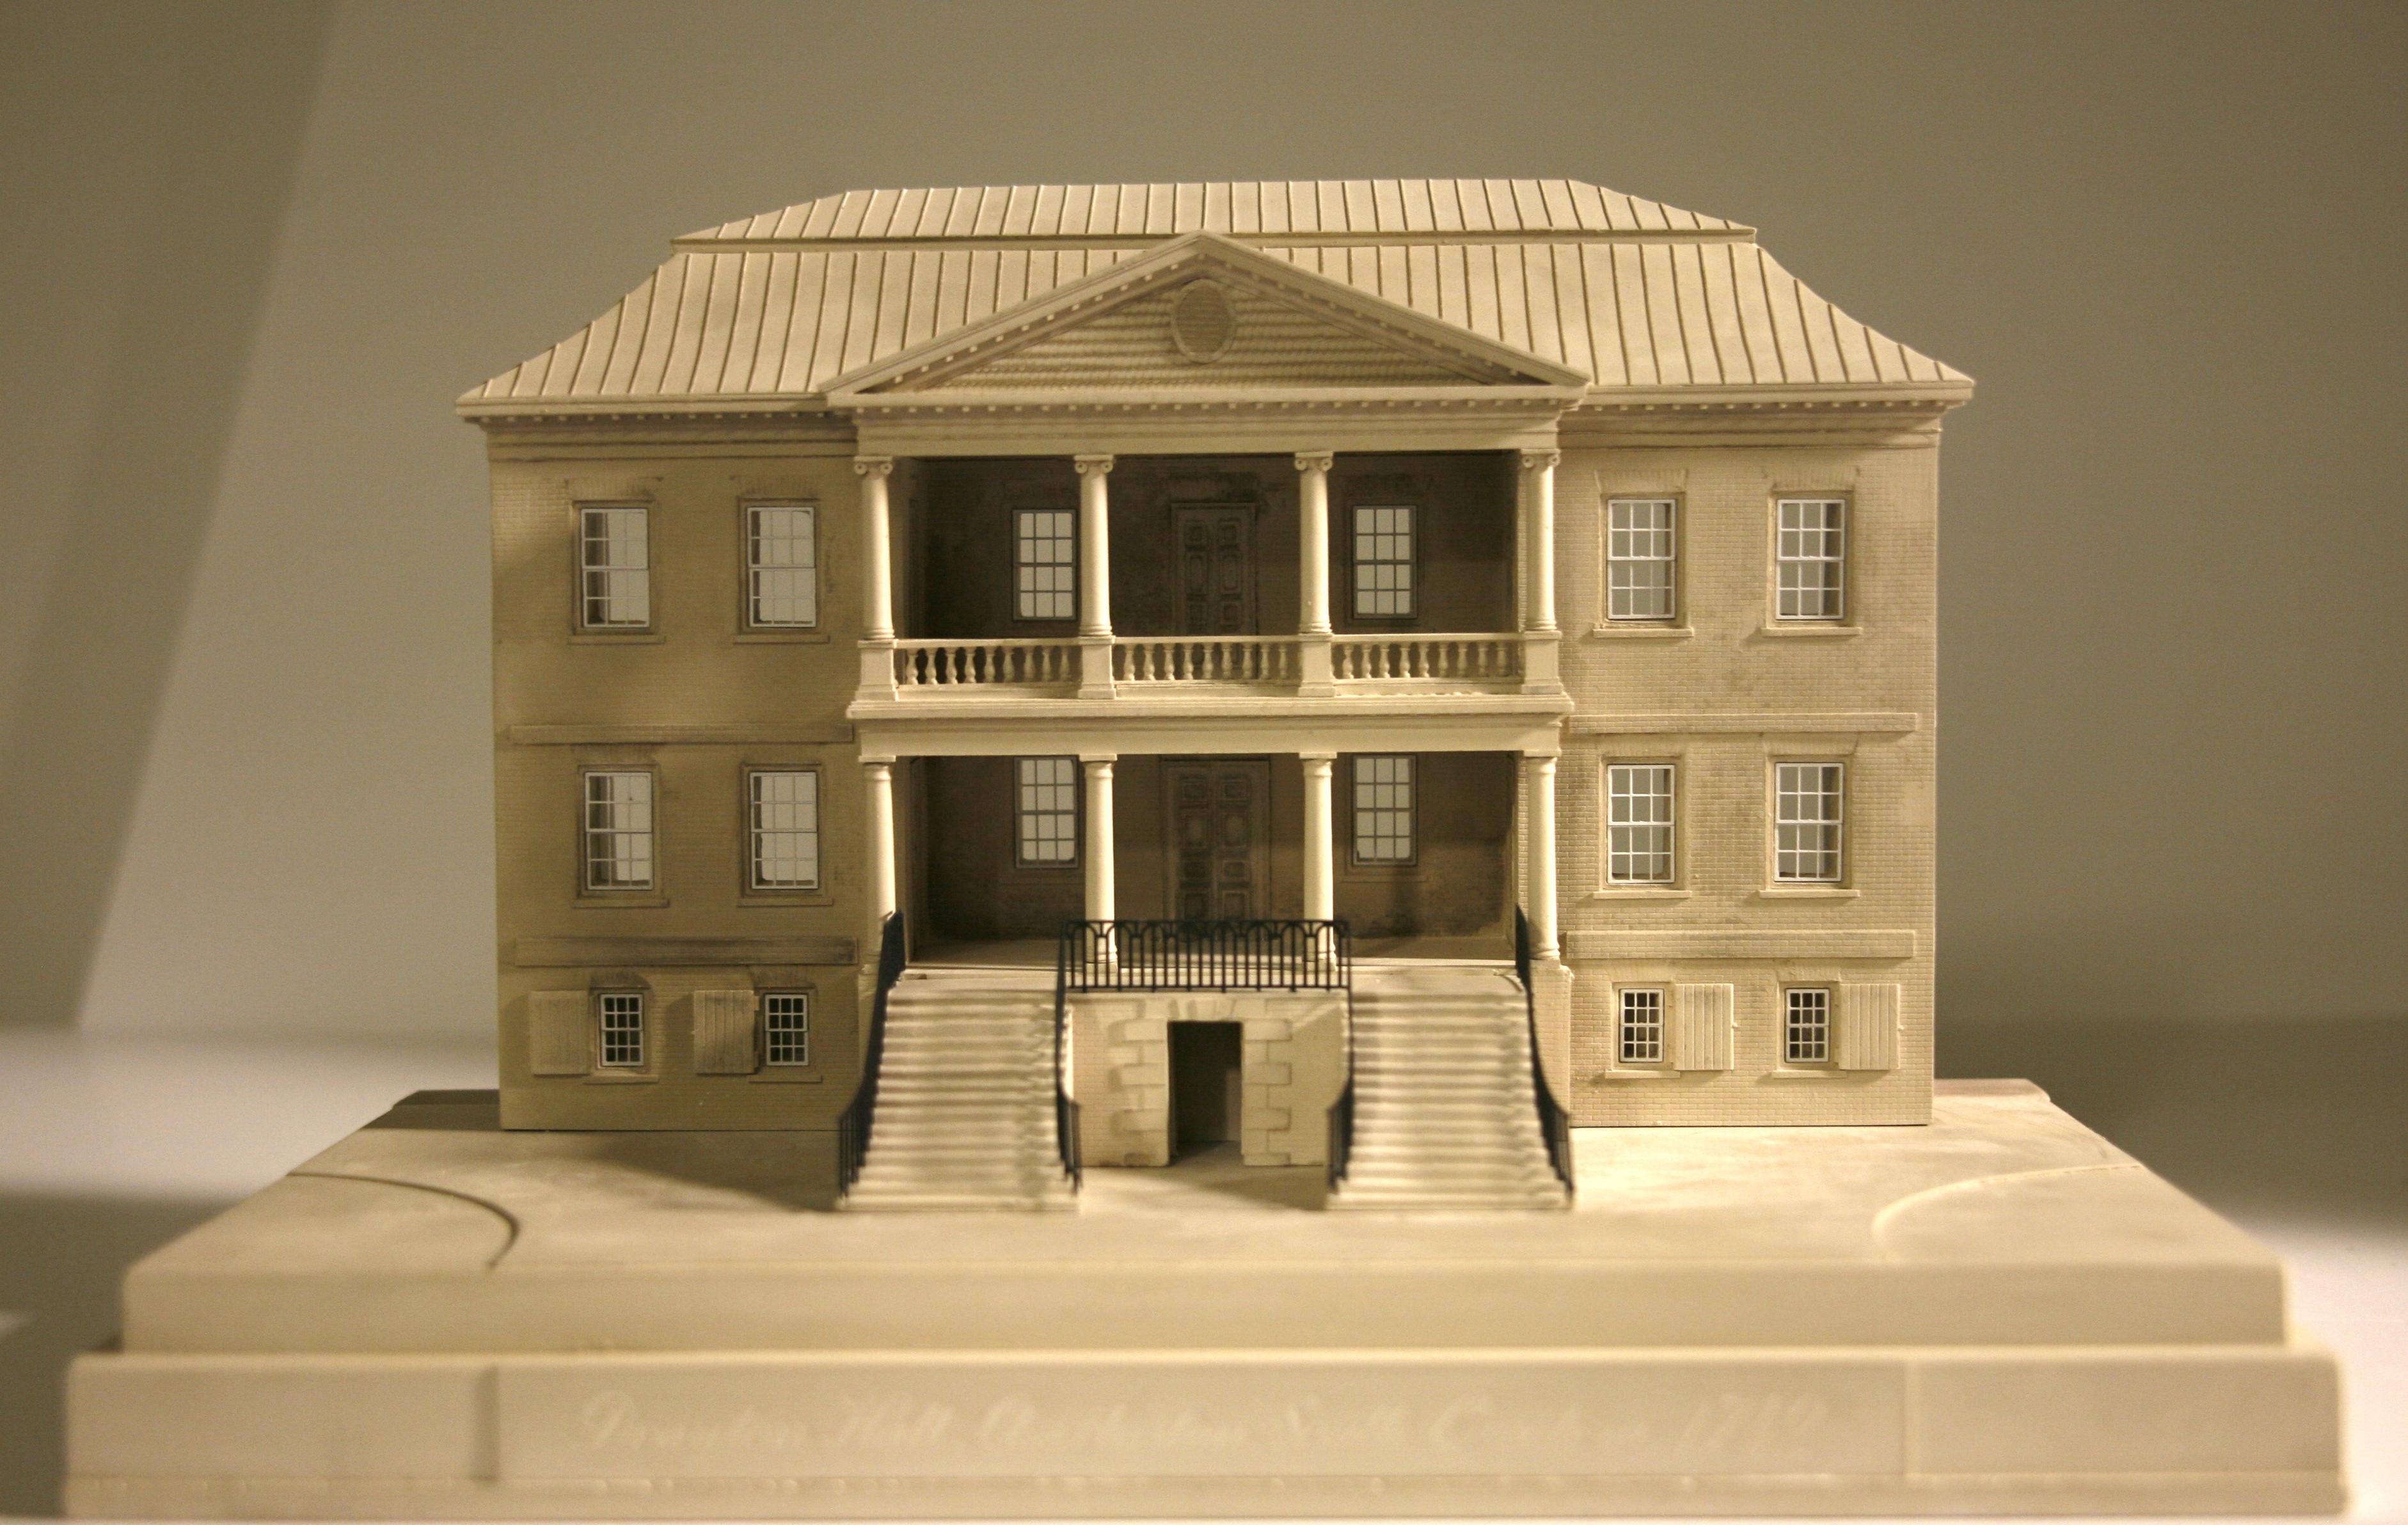 palladio1-drayton-hall-charleston-south-carolina-copy